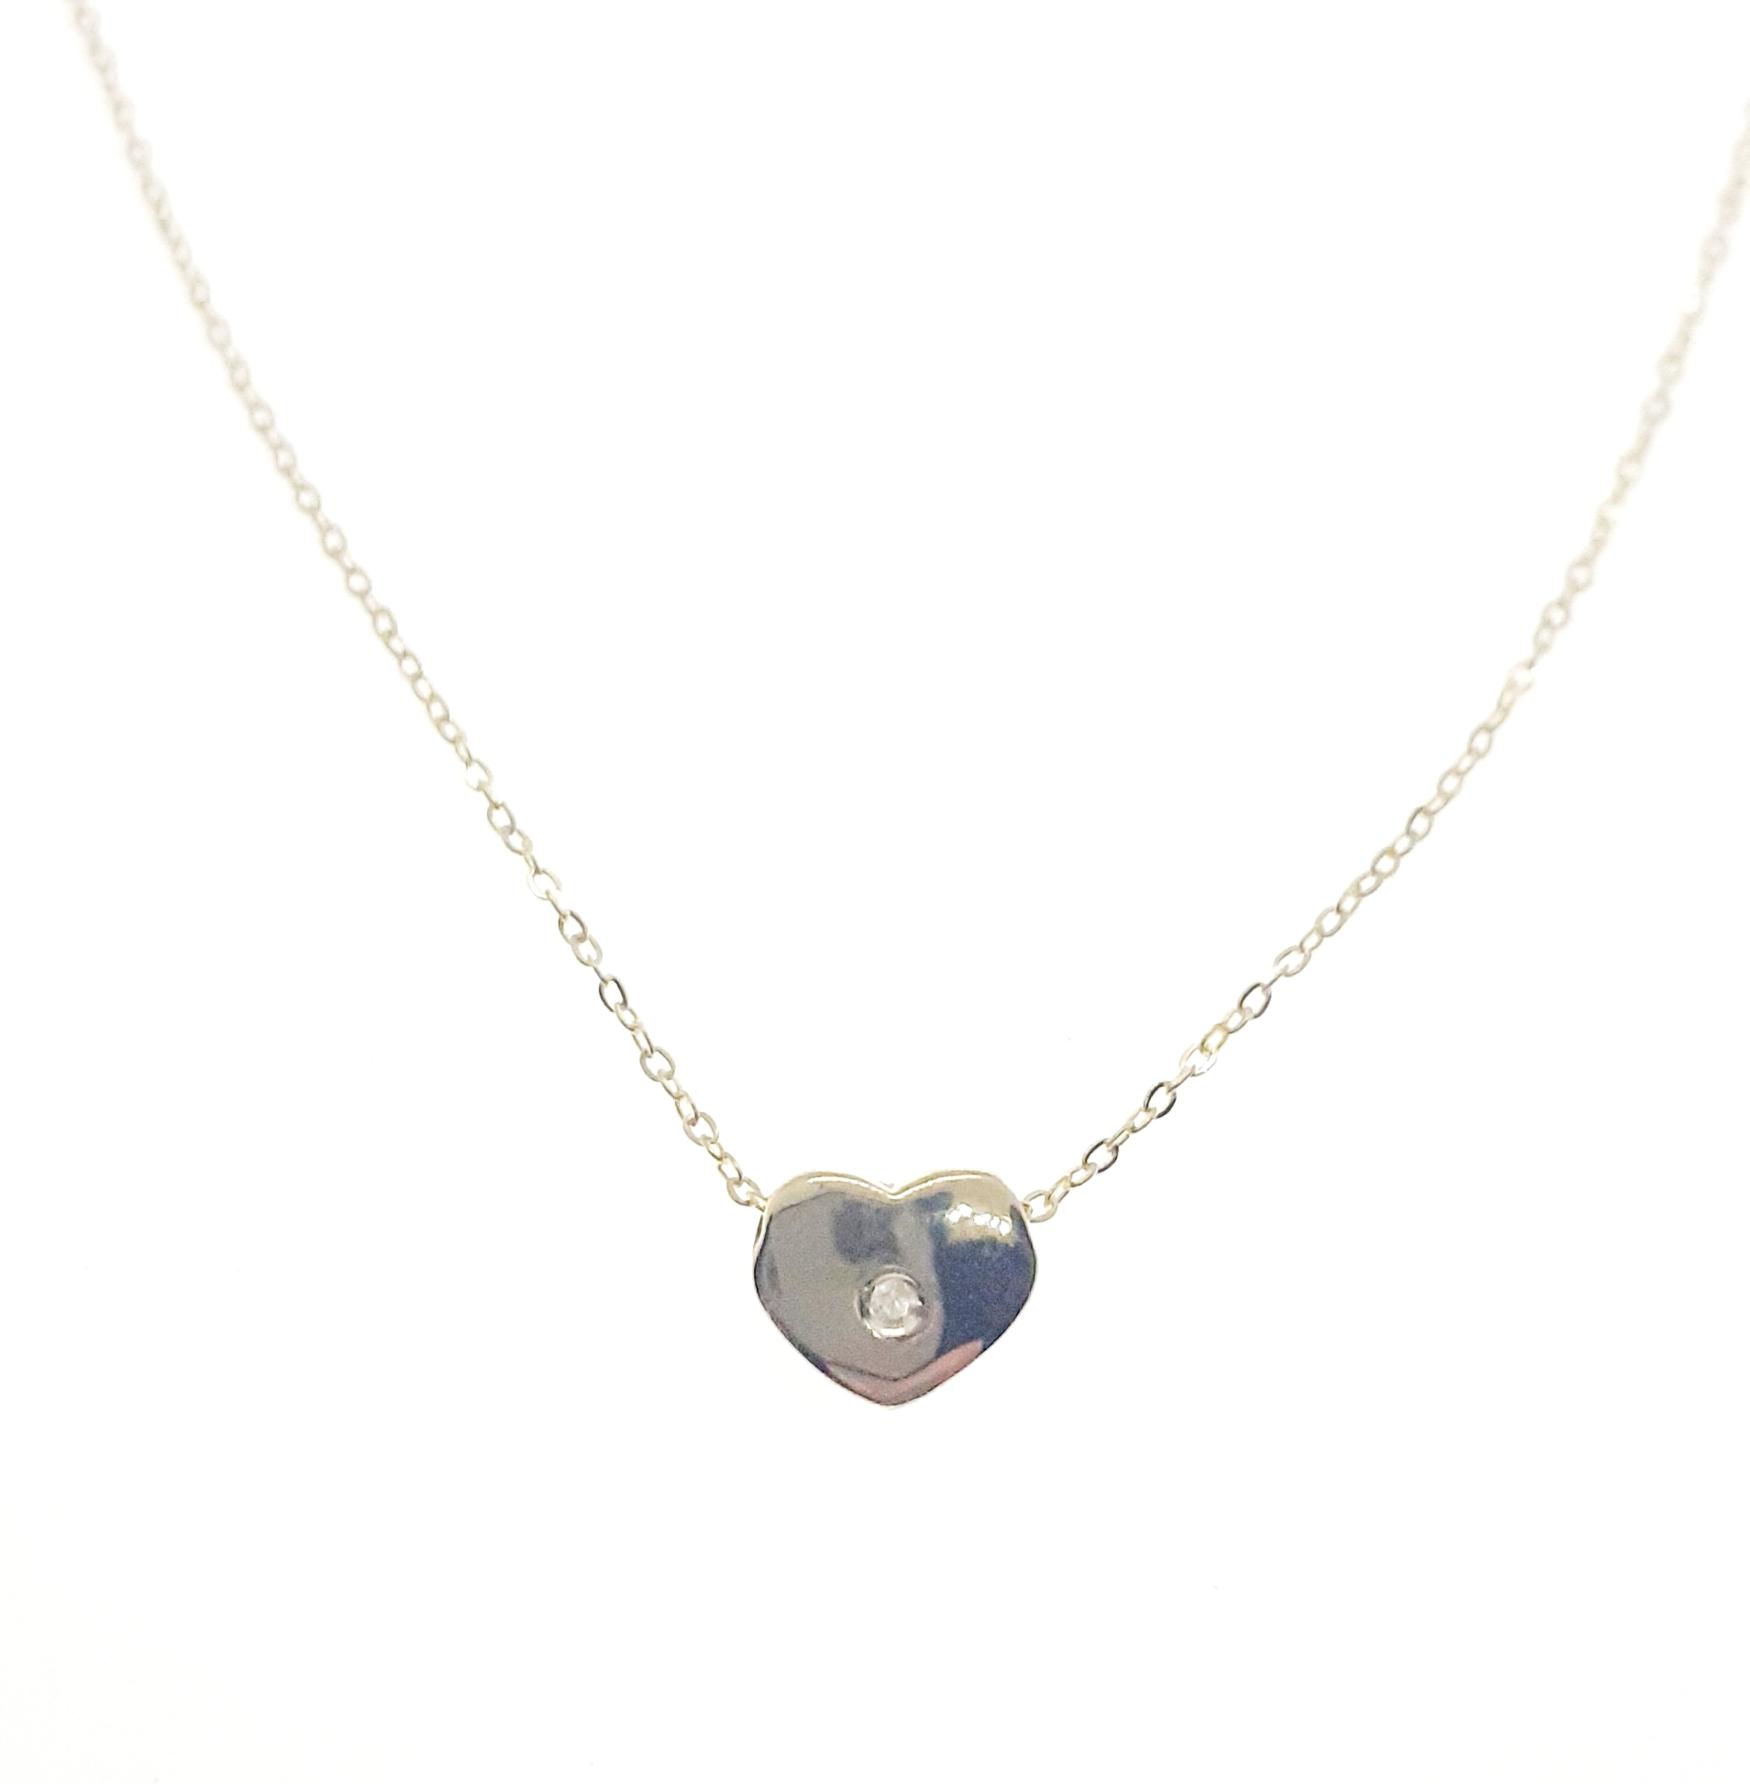 Sensi joyas jewellery Granada silver engagement18K GOLD AND  DIAMOND PENDANT